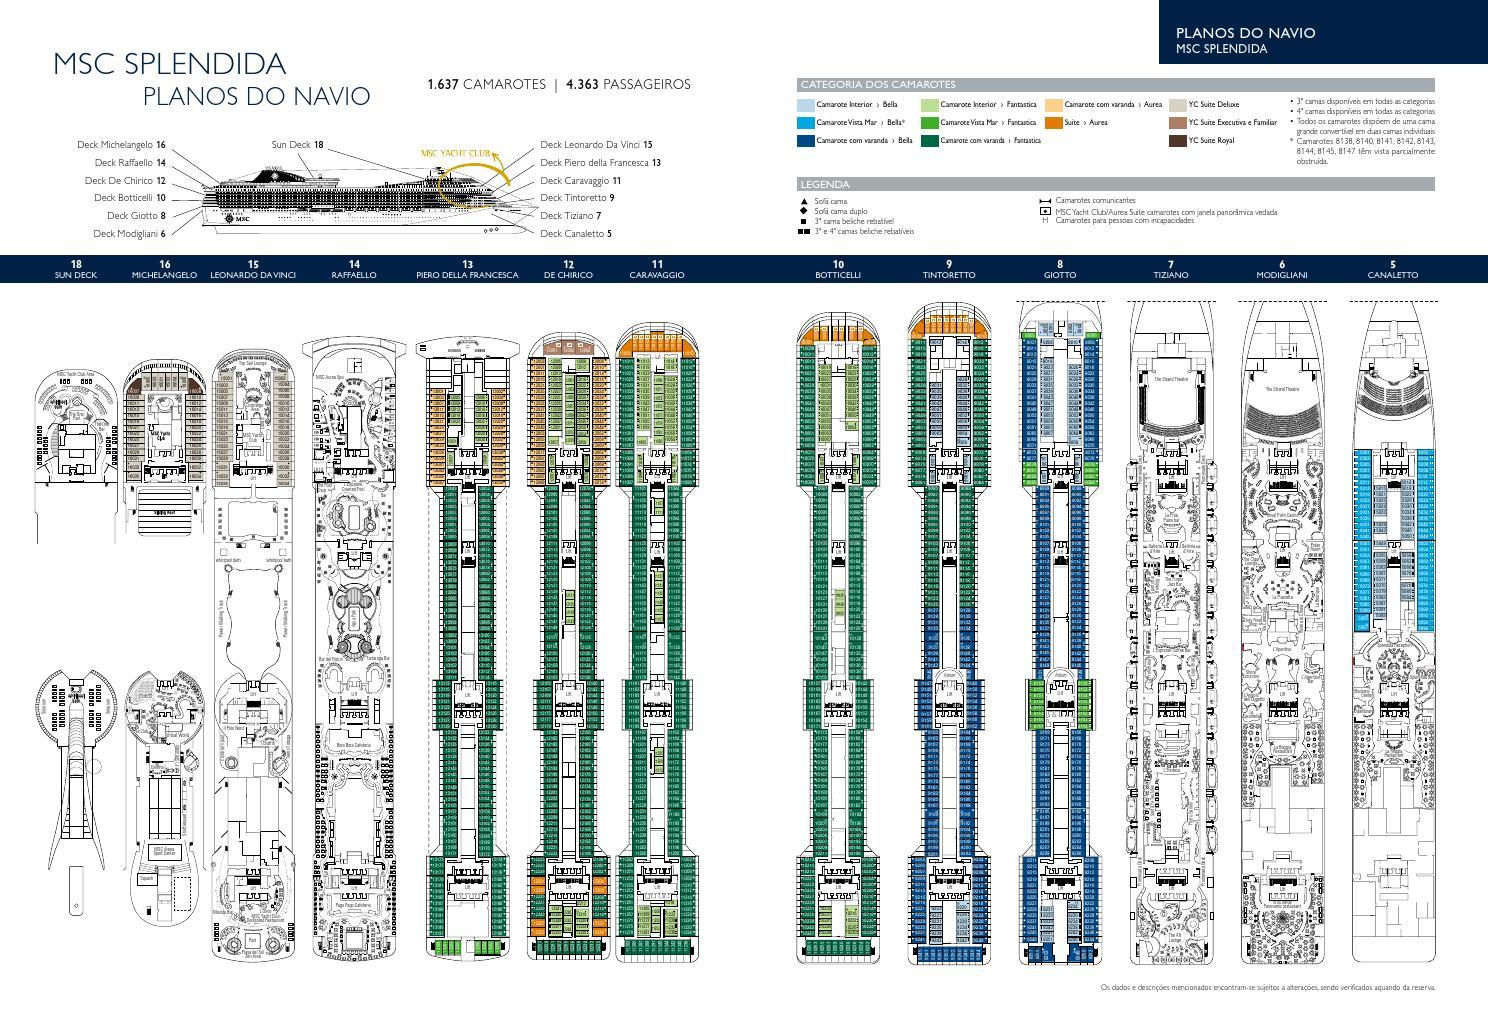 Mscsplendida deckplans port tcm32 80729 by ego travel issuu baanklon Gallery